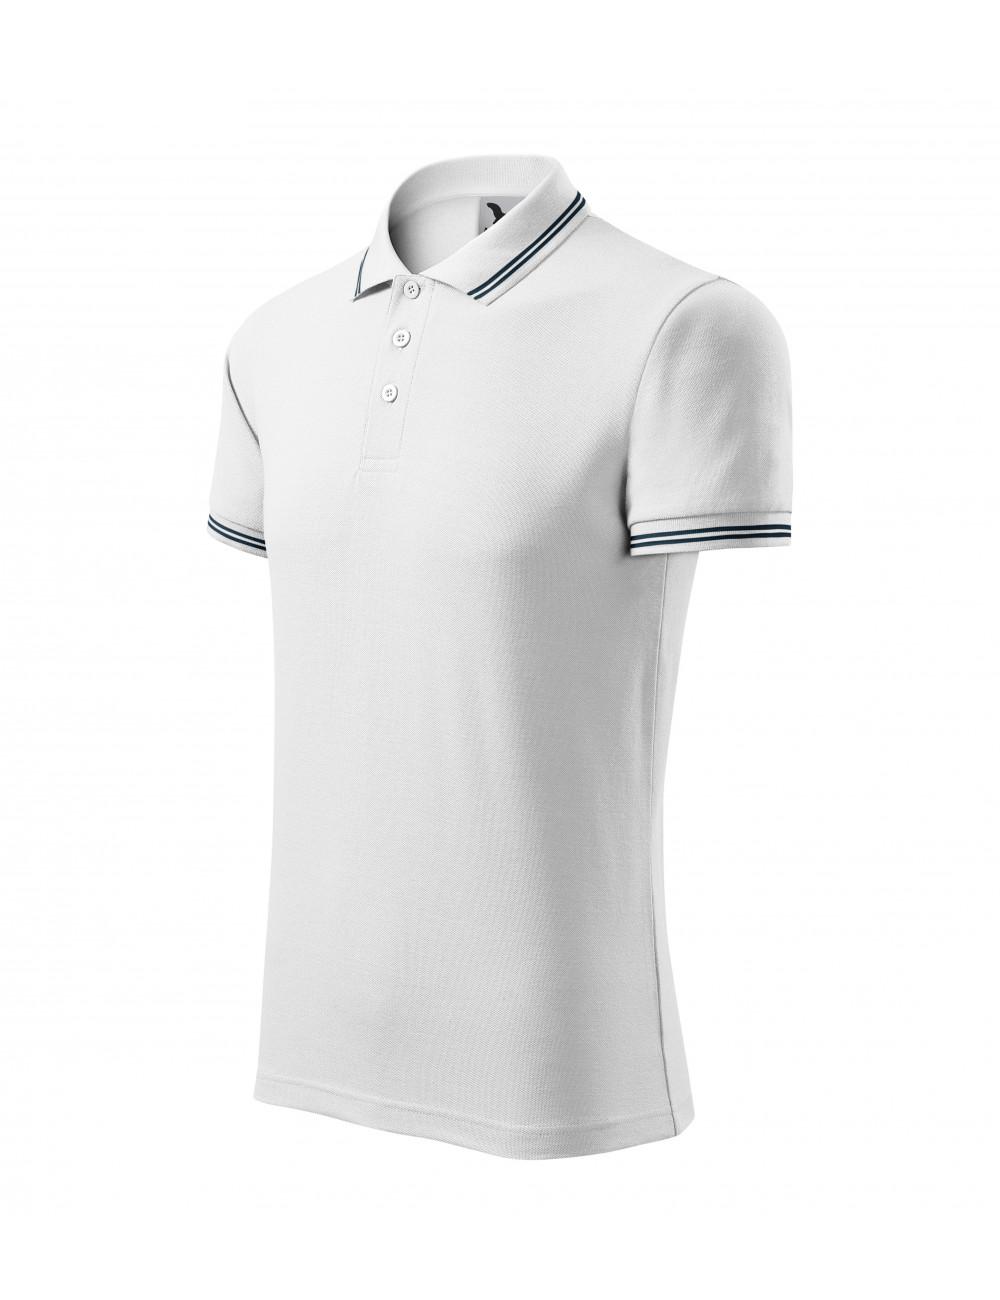 Adler MALFINI Koszulka polo męska Urban 219 biały